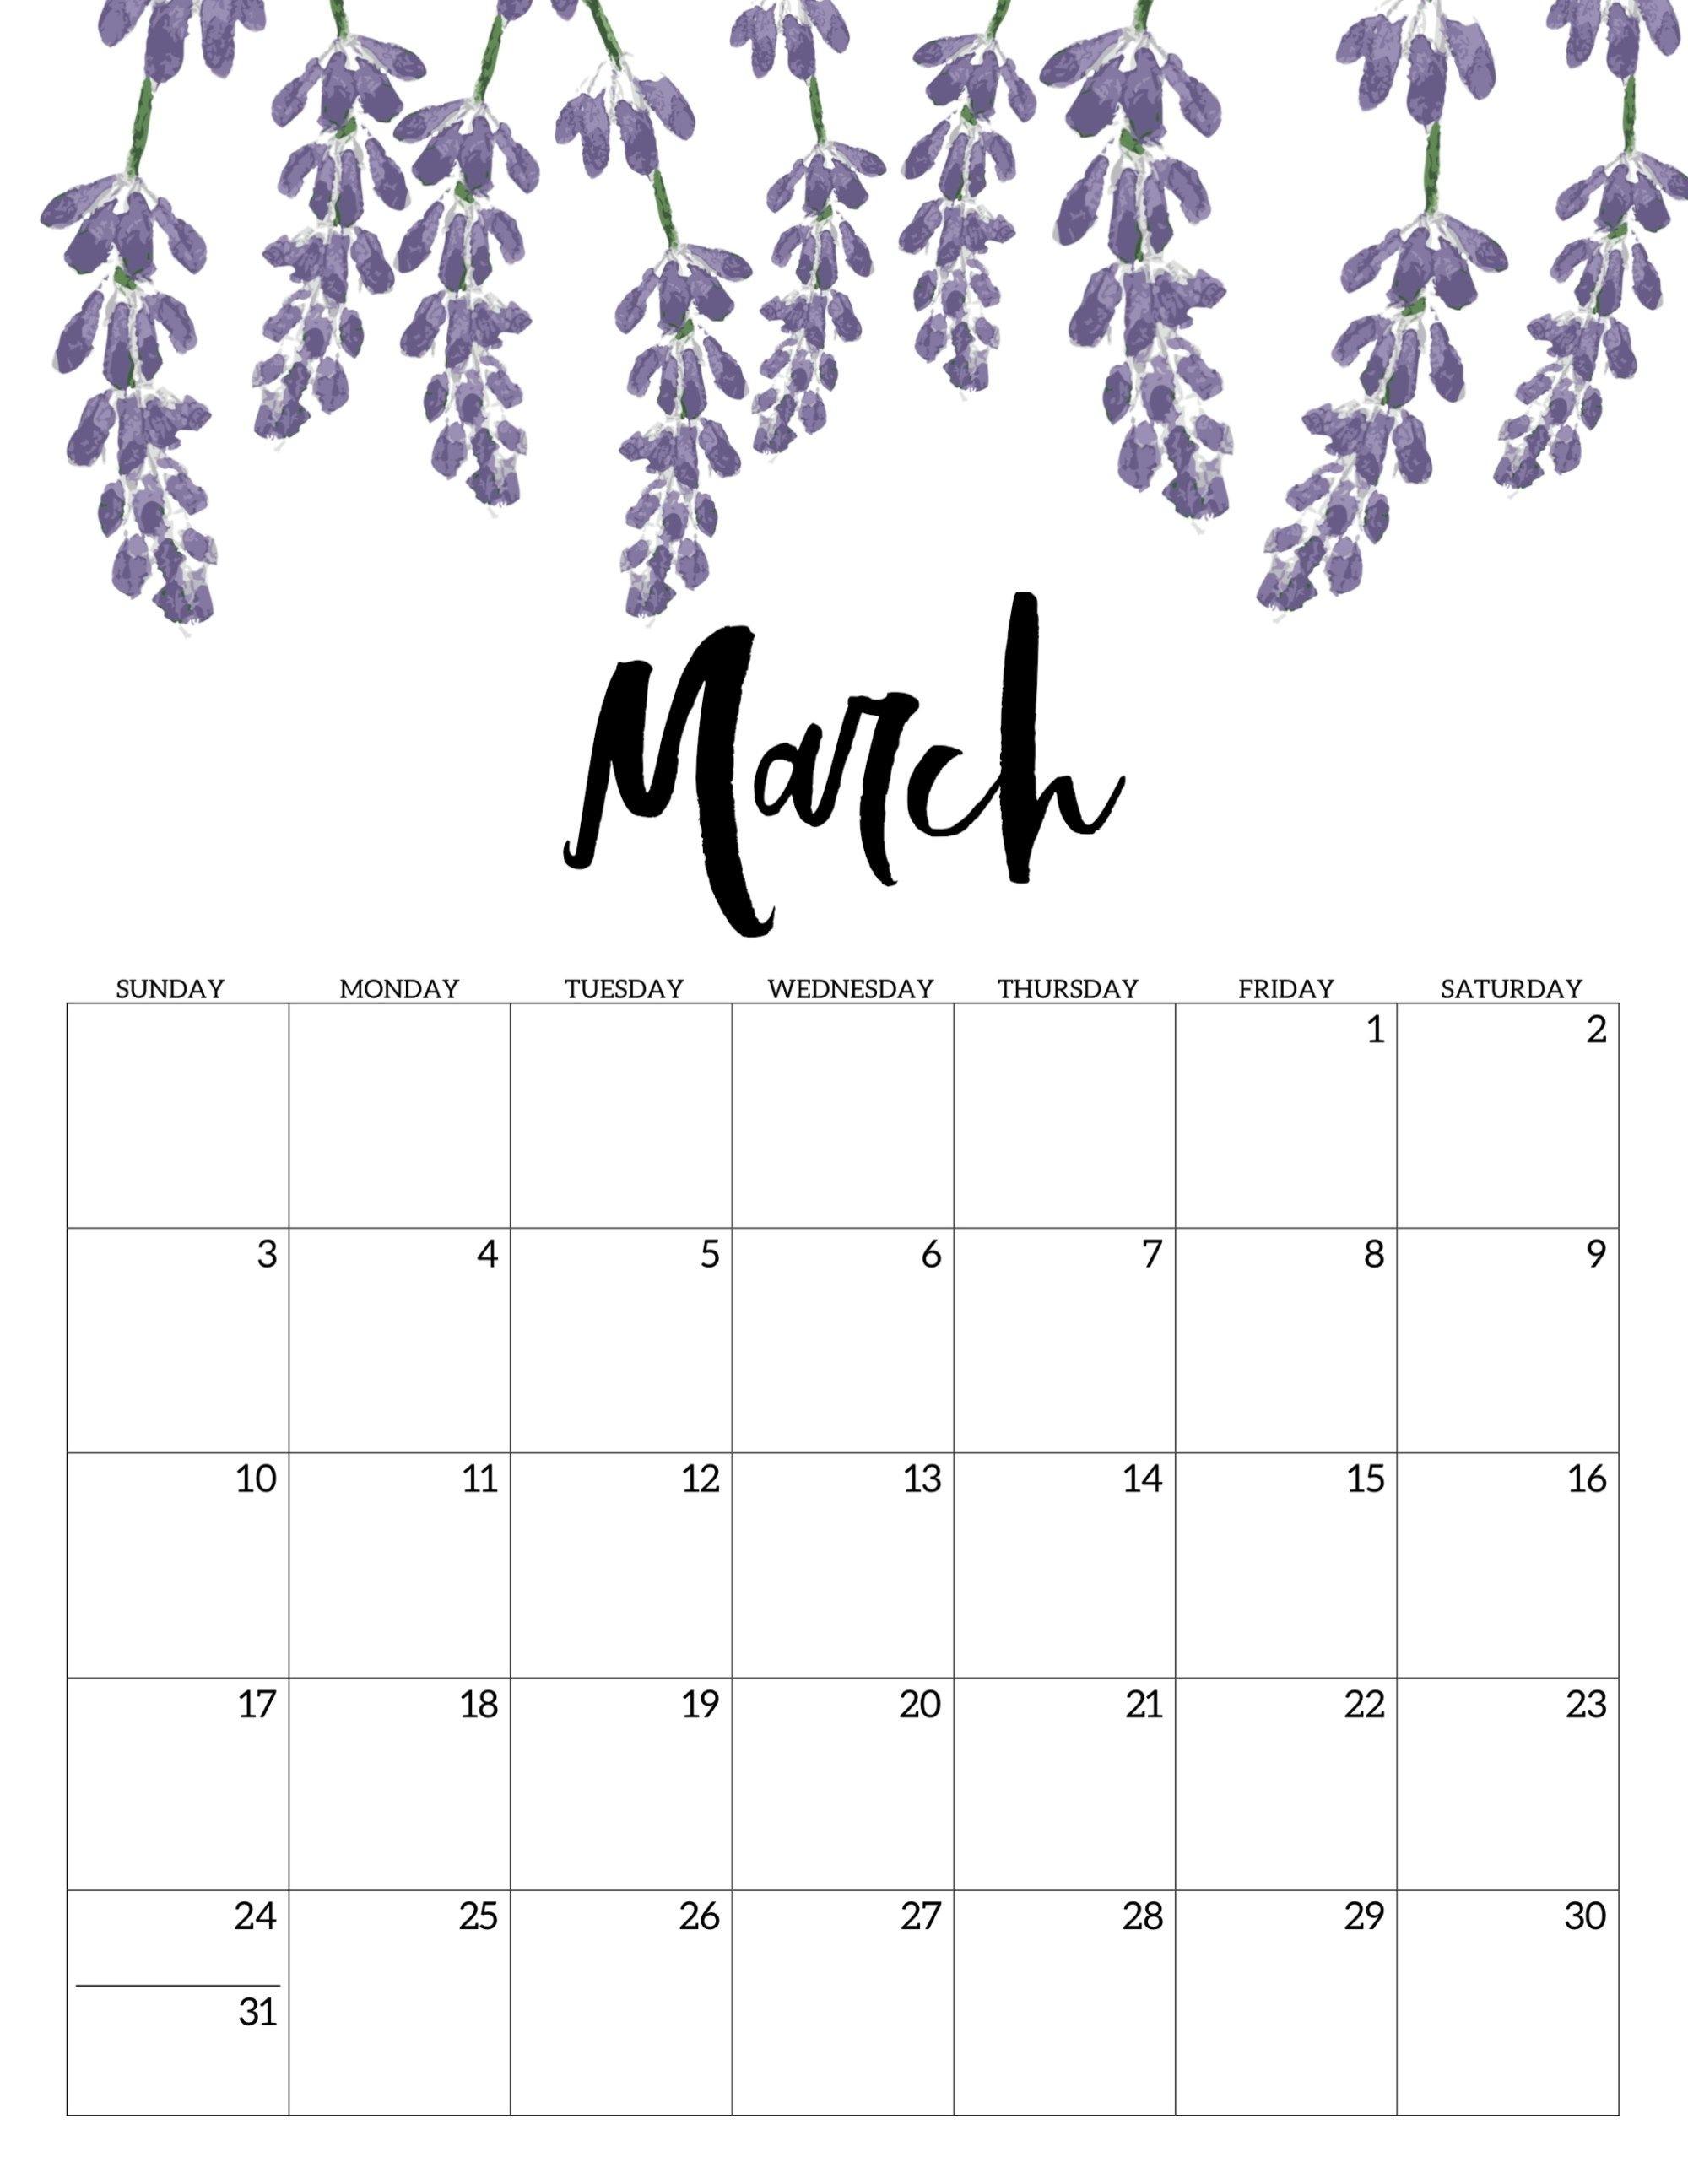 Free Printable Calendar 2019 - Floral | Study | Calendar, 2019 Print Blank Calendar Office 365